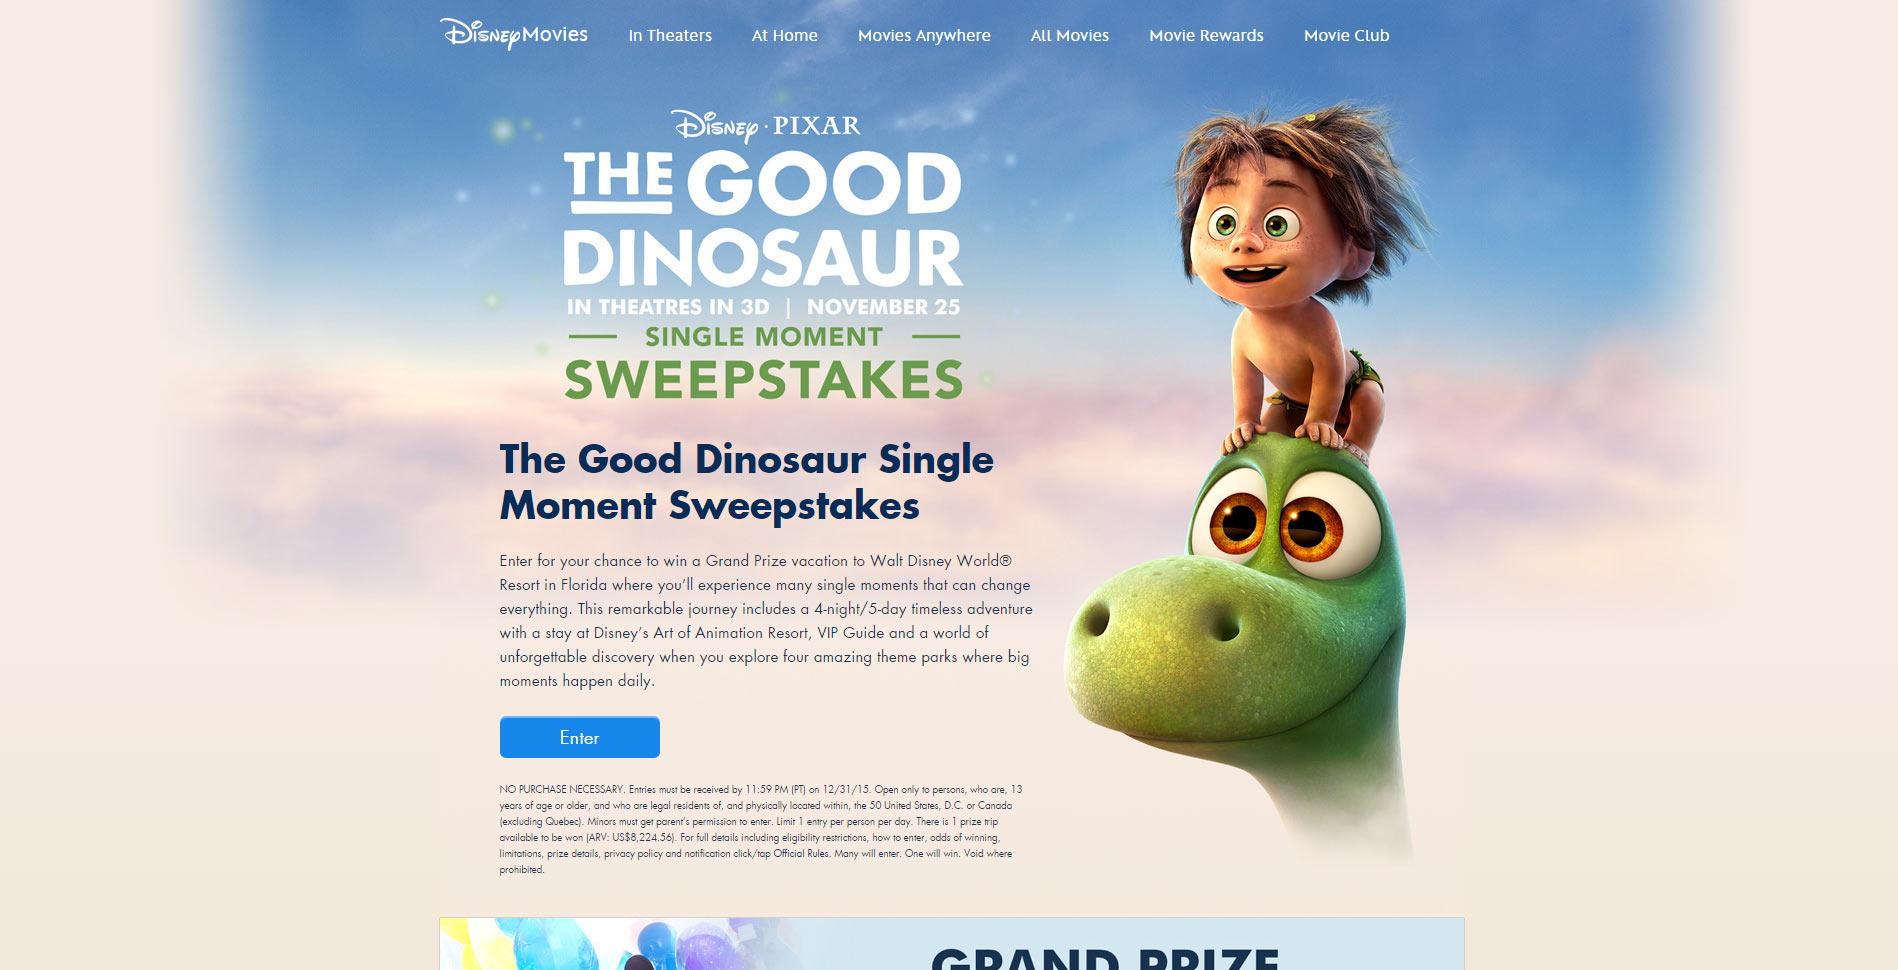 Disney.com/GoodDinoSweeps - Disney-Pixar's The Good Dinosaur Single Moment Sweepstakes